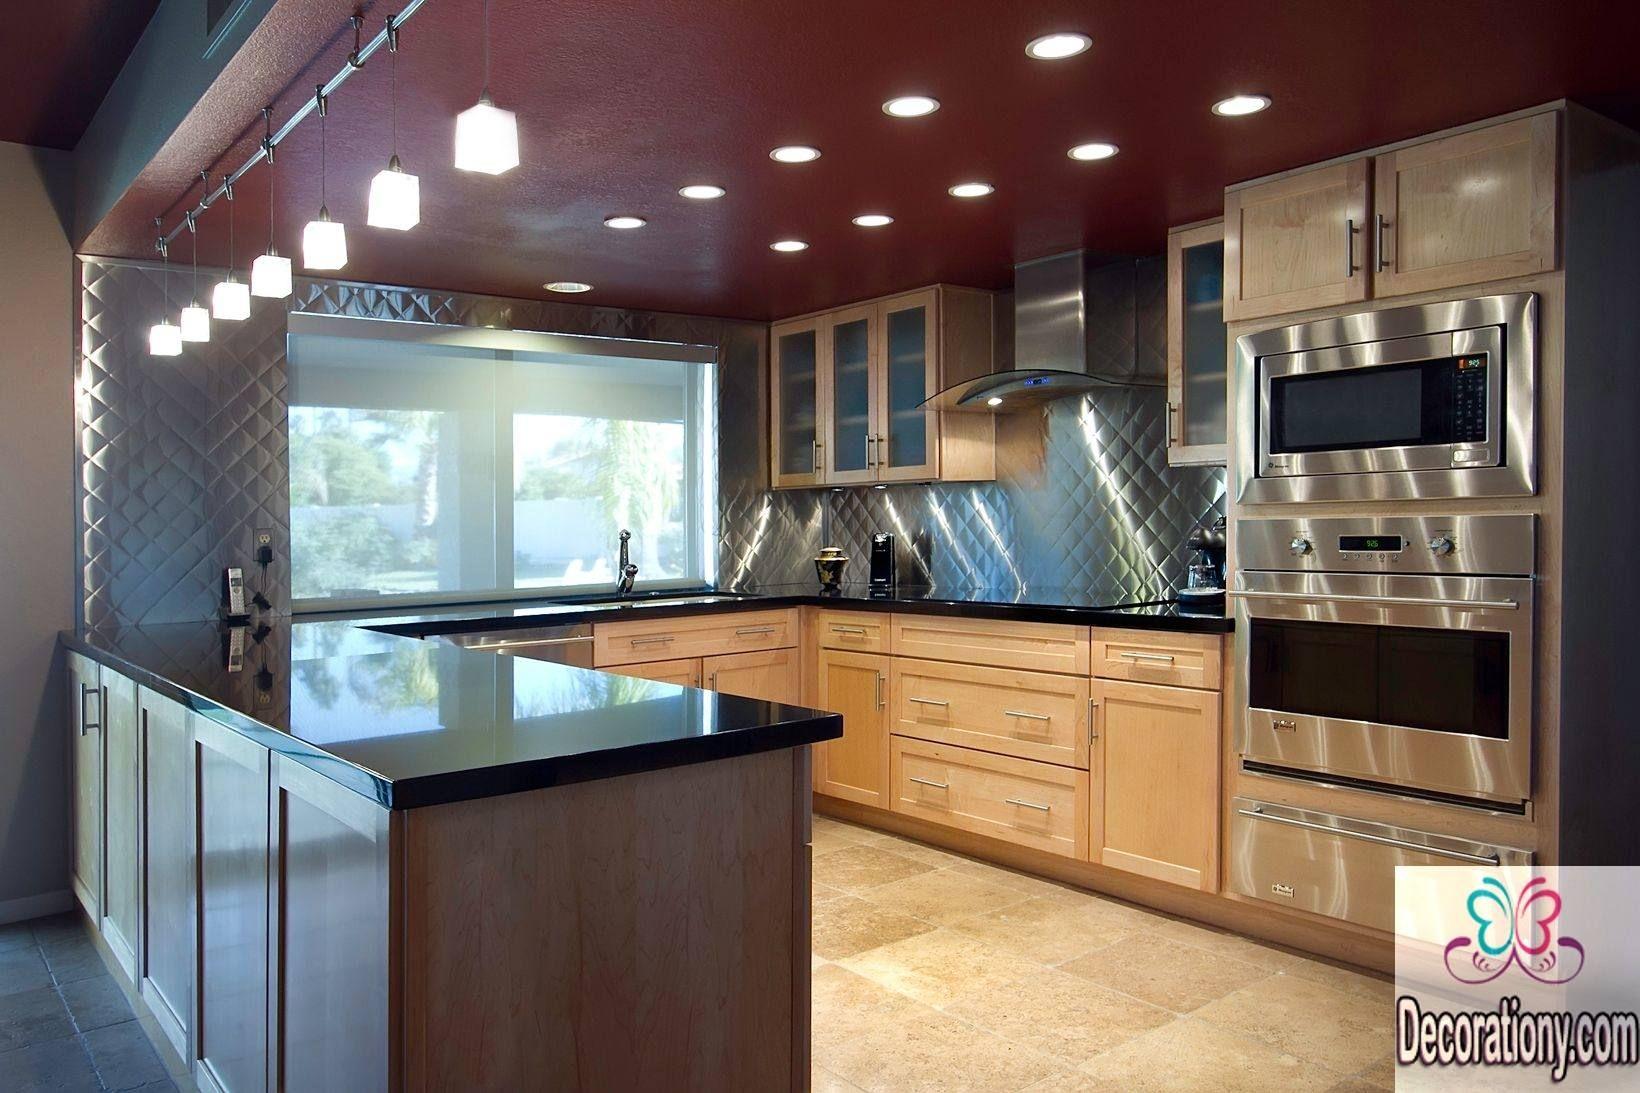 modern cabinet refacing. Latest Kitchen Remodel Ideas Cabinet Refacing Remodeling Small For Brand New Look Home Interior Design Modern